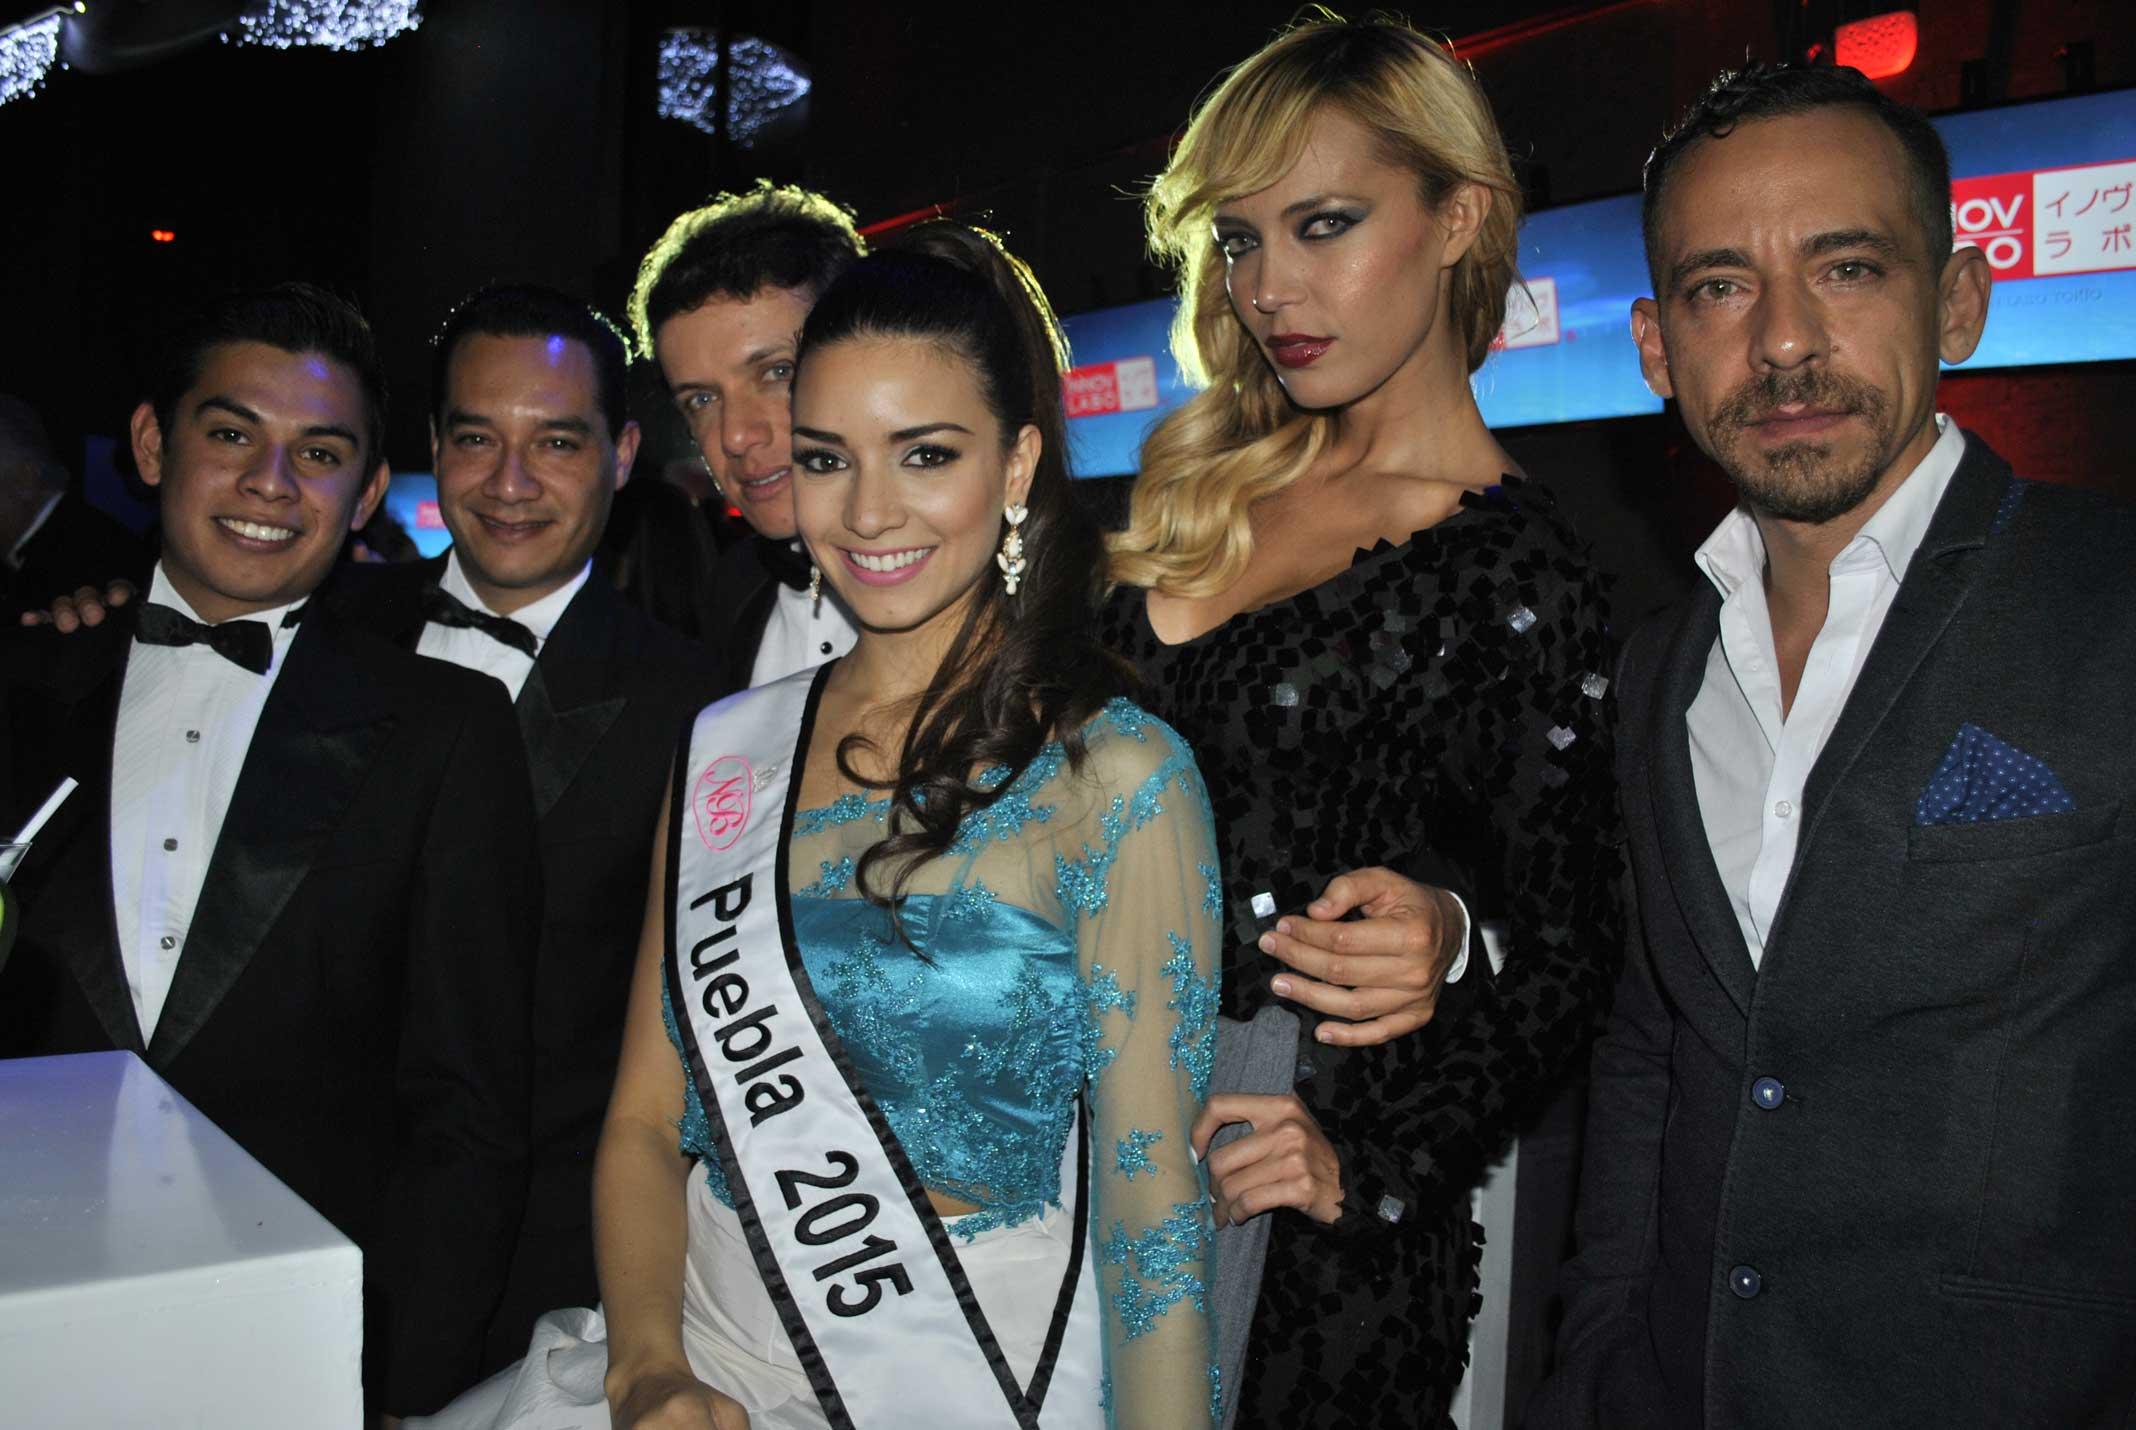 Steffan Flores, Alan Martínez, Jorge Maceda, Lorena Chayban, Jou Glez y René Ortiz